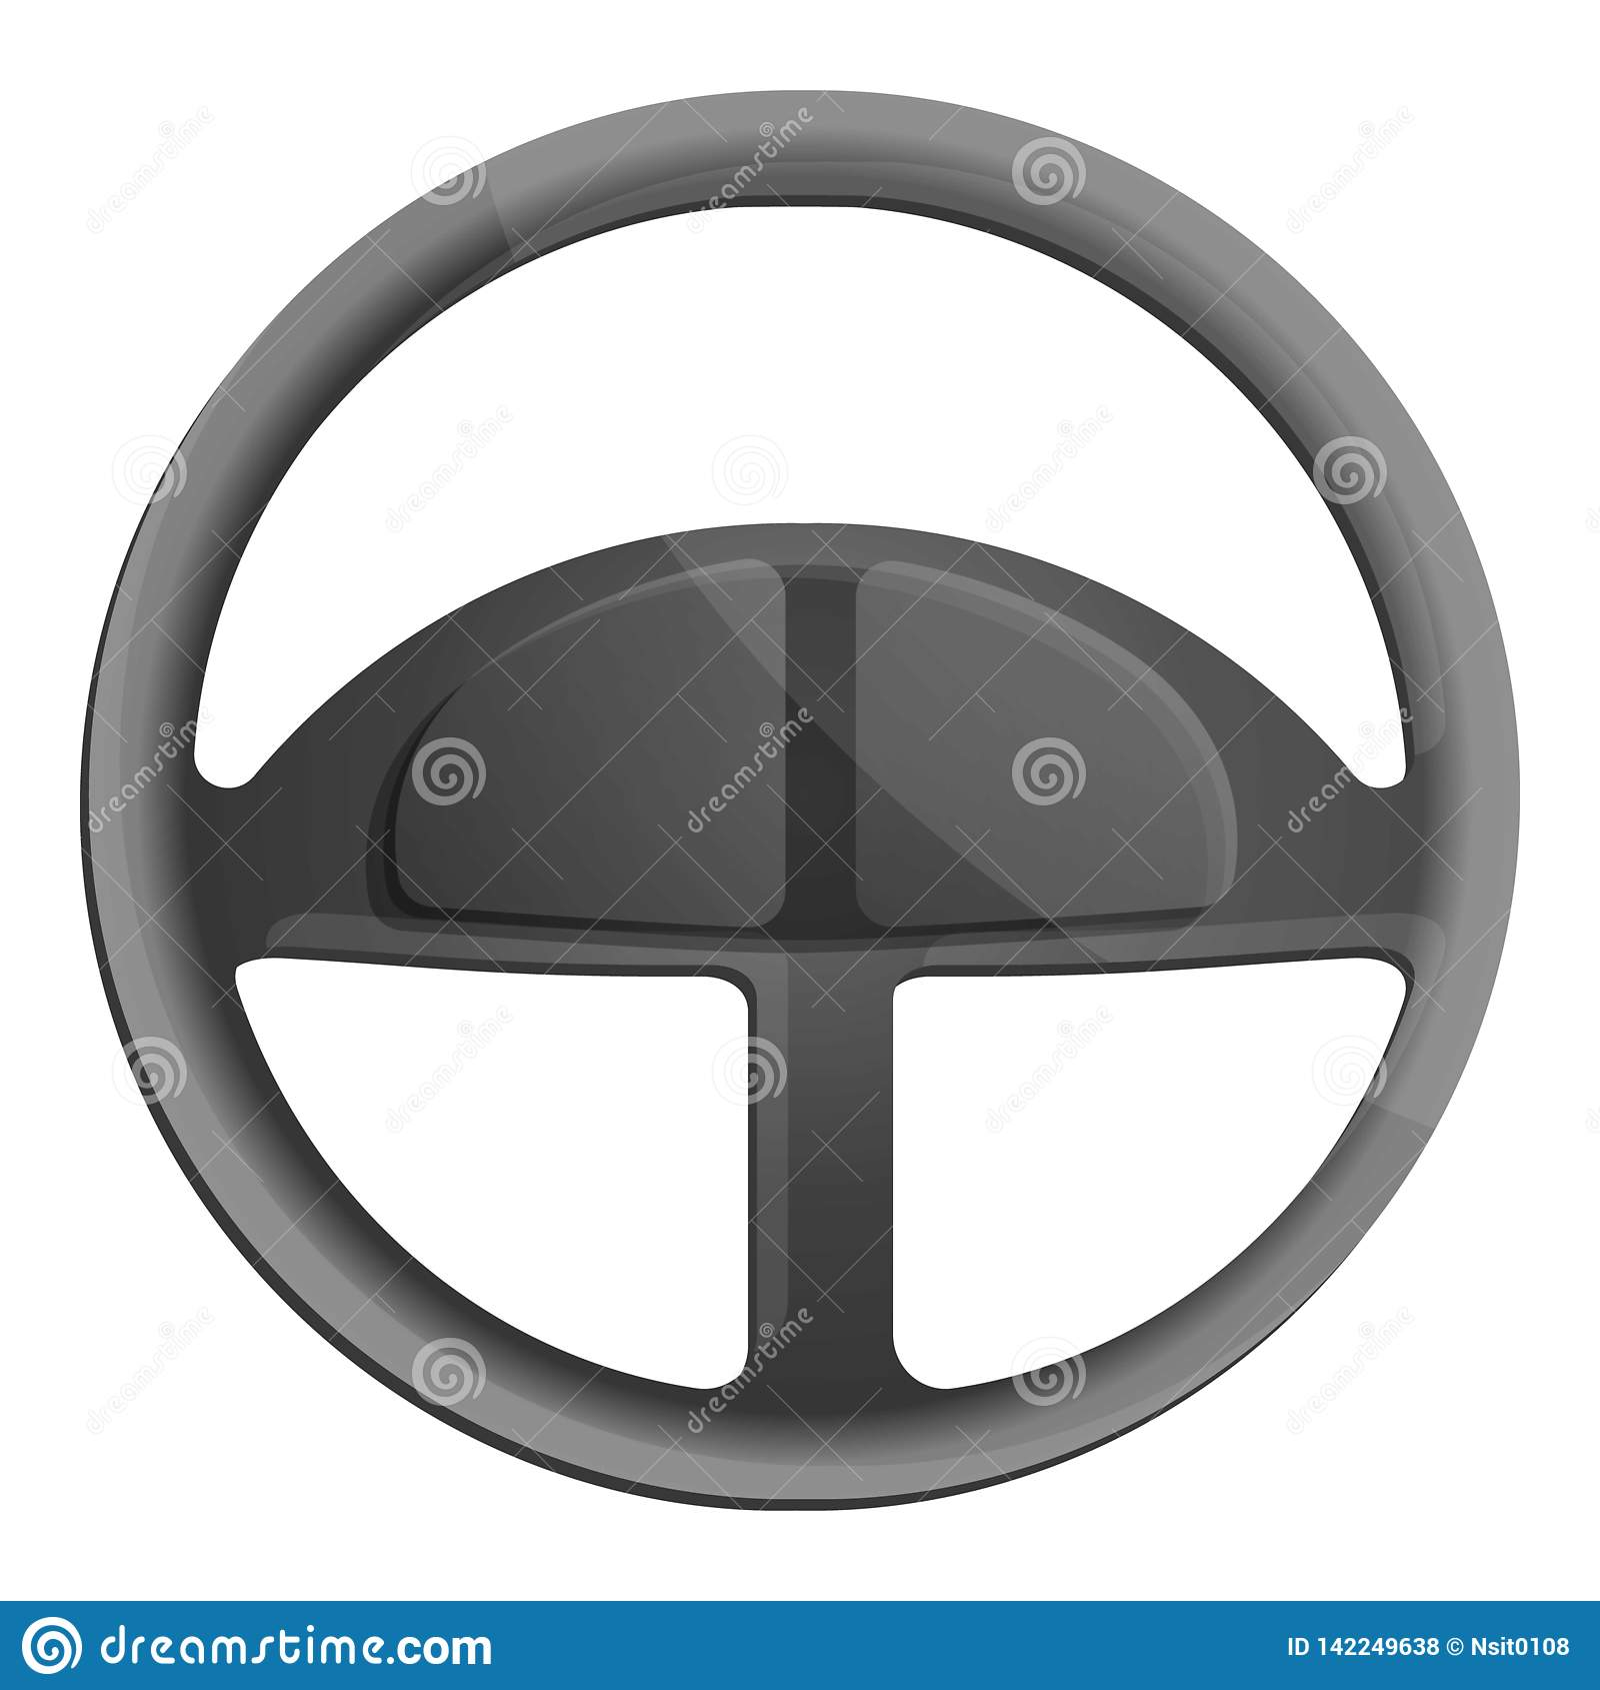 Car Steering Wheel Icon Cartoon Style Stock Vector Illustration Of Simplicity Logo 142249638